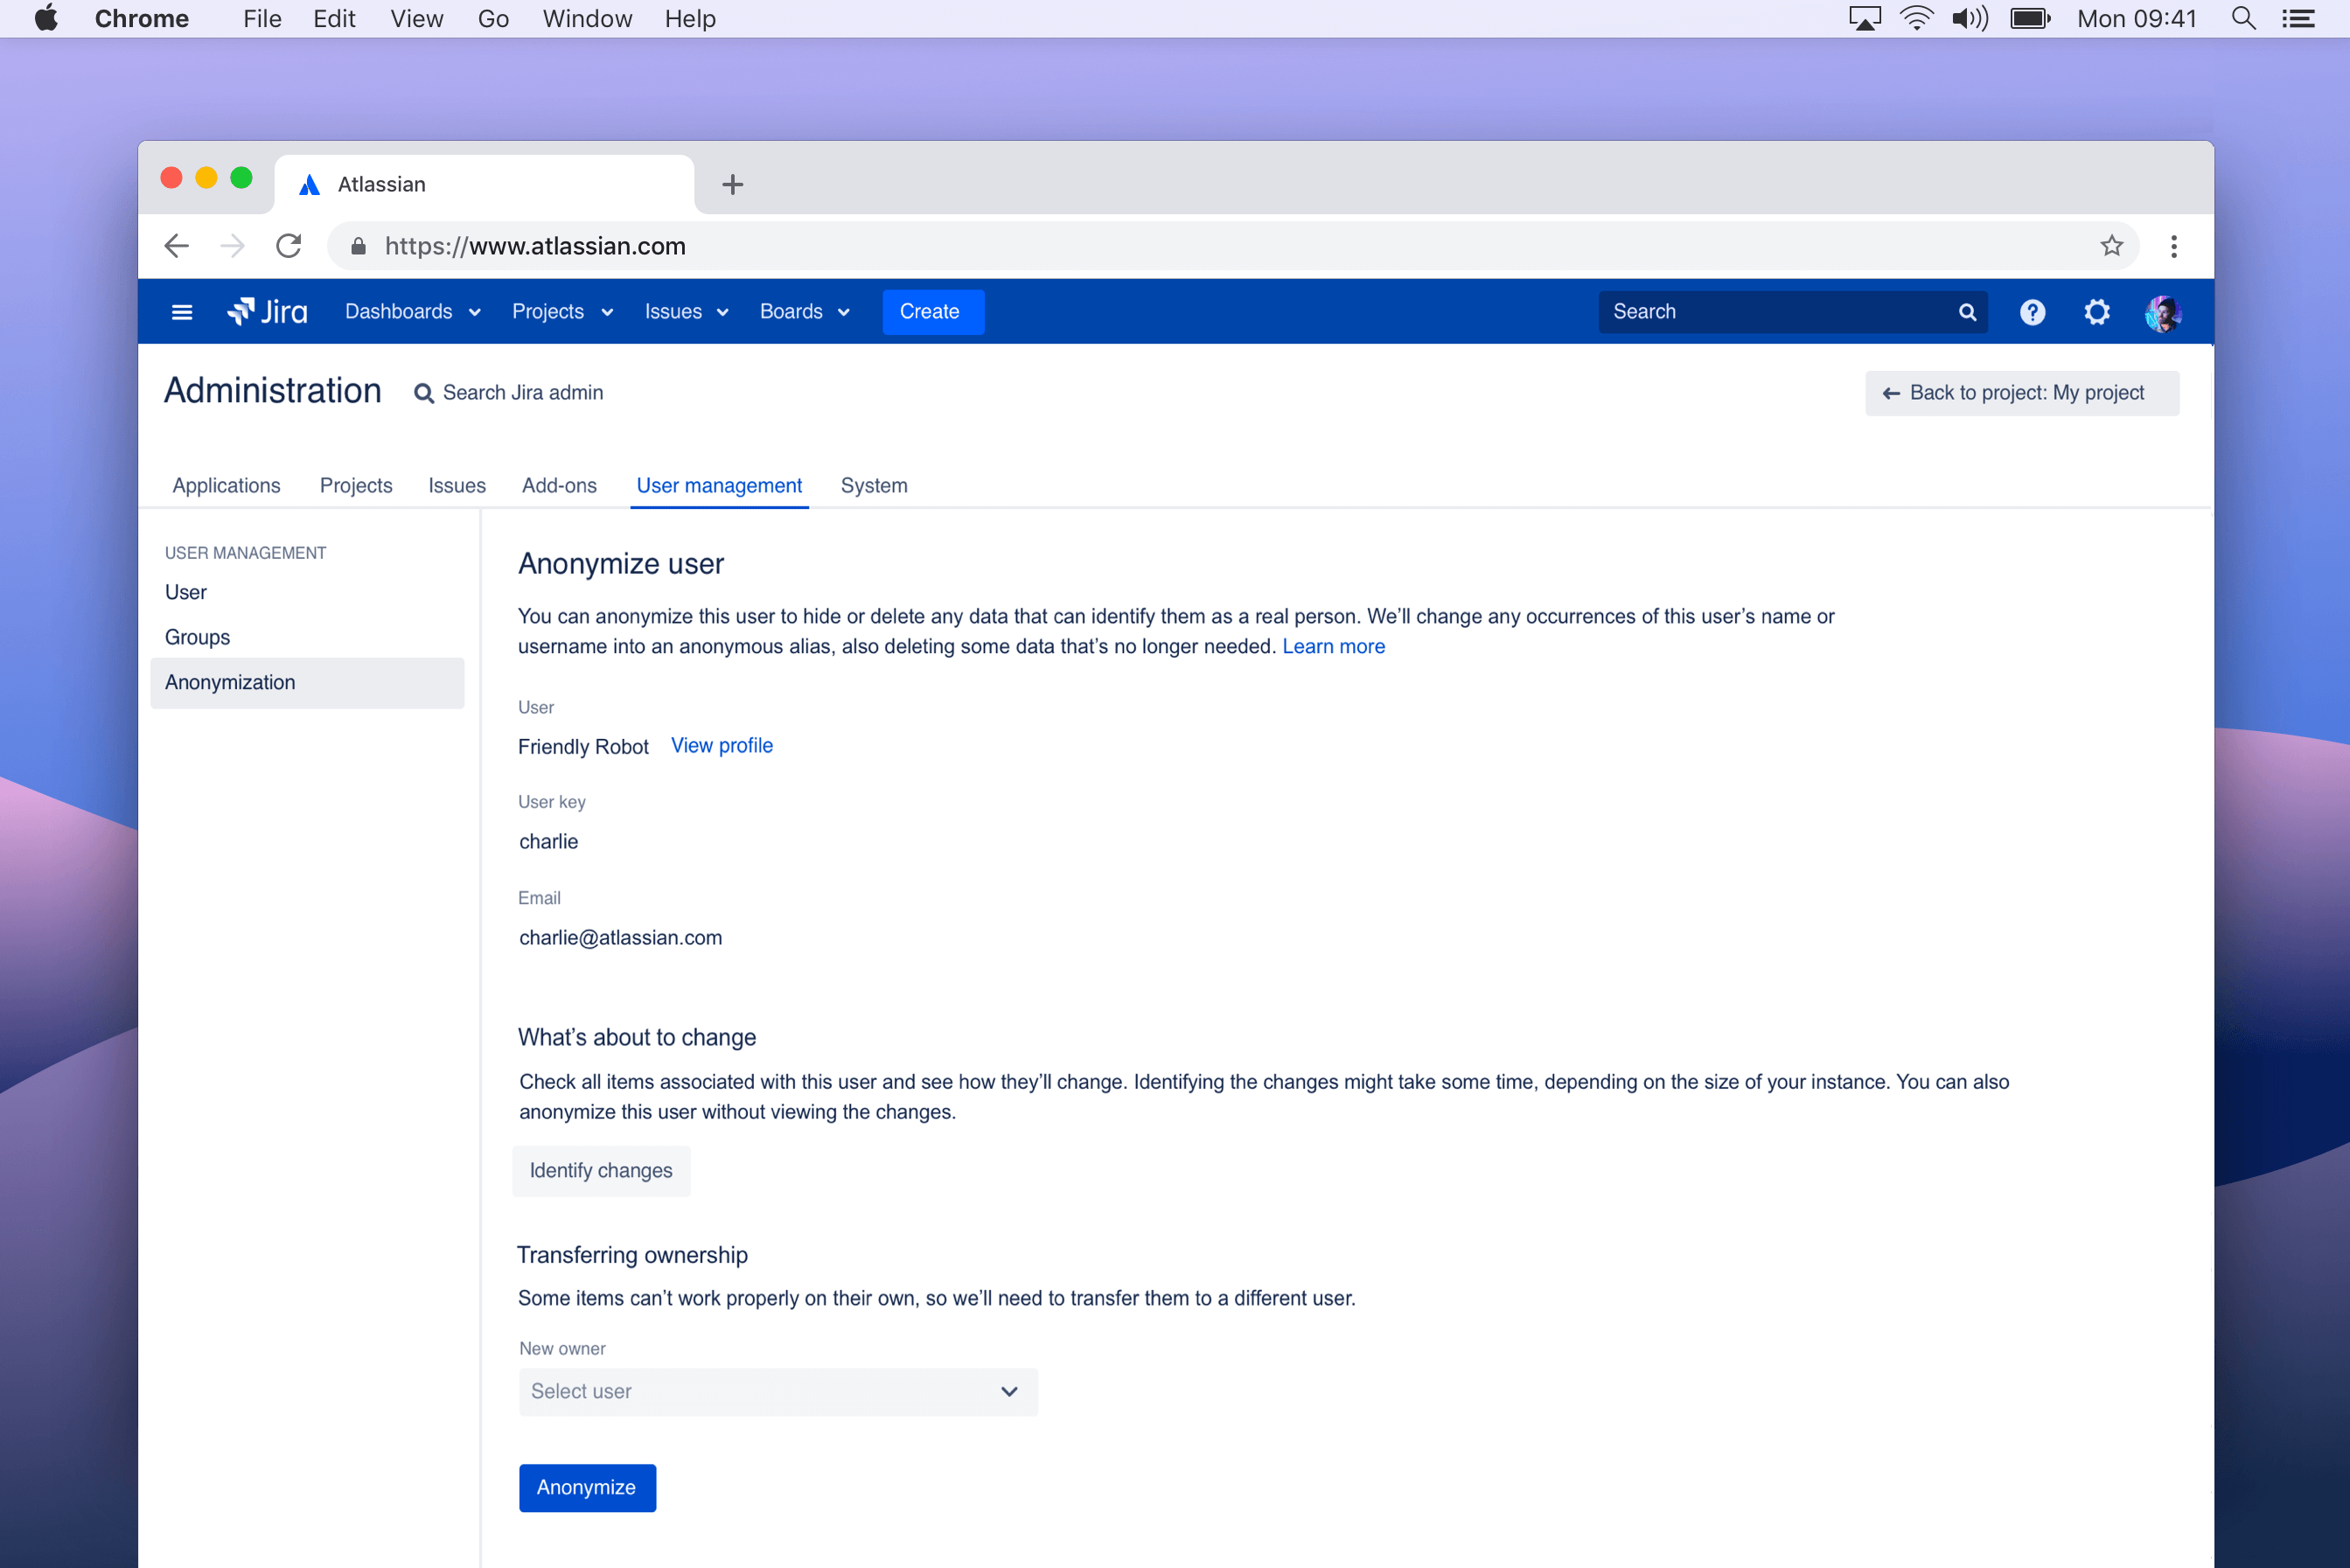 Jira Service Desk GDPR compliance screenshot